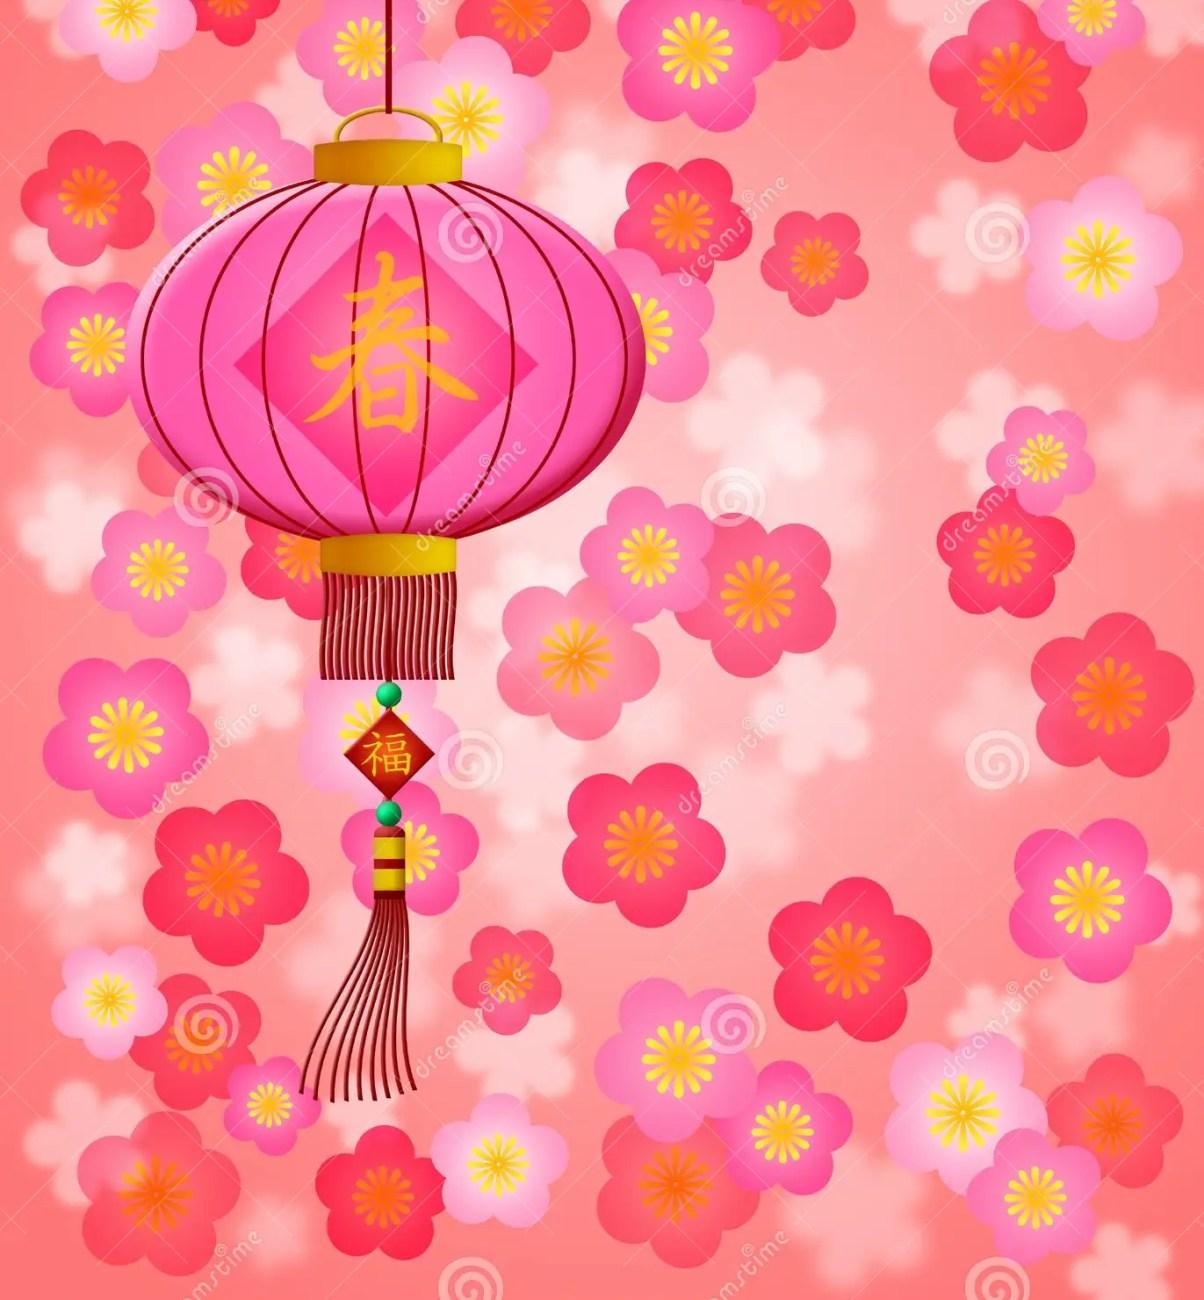 chinese new year lantern cherry blossom royalty free stock image